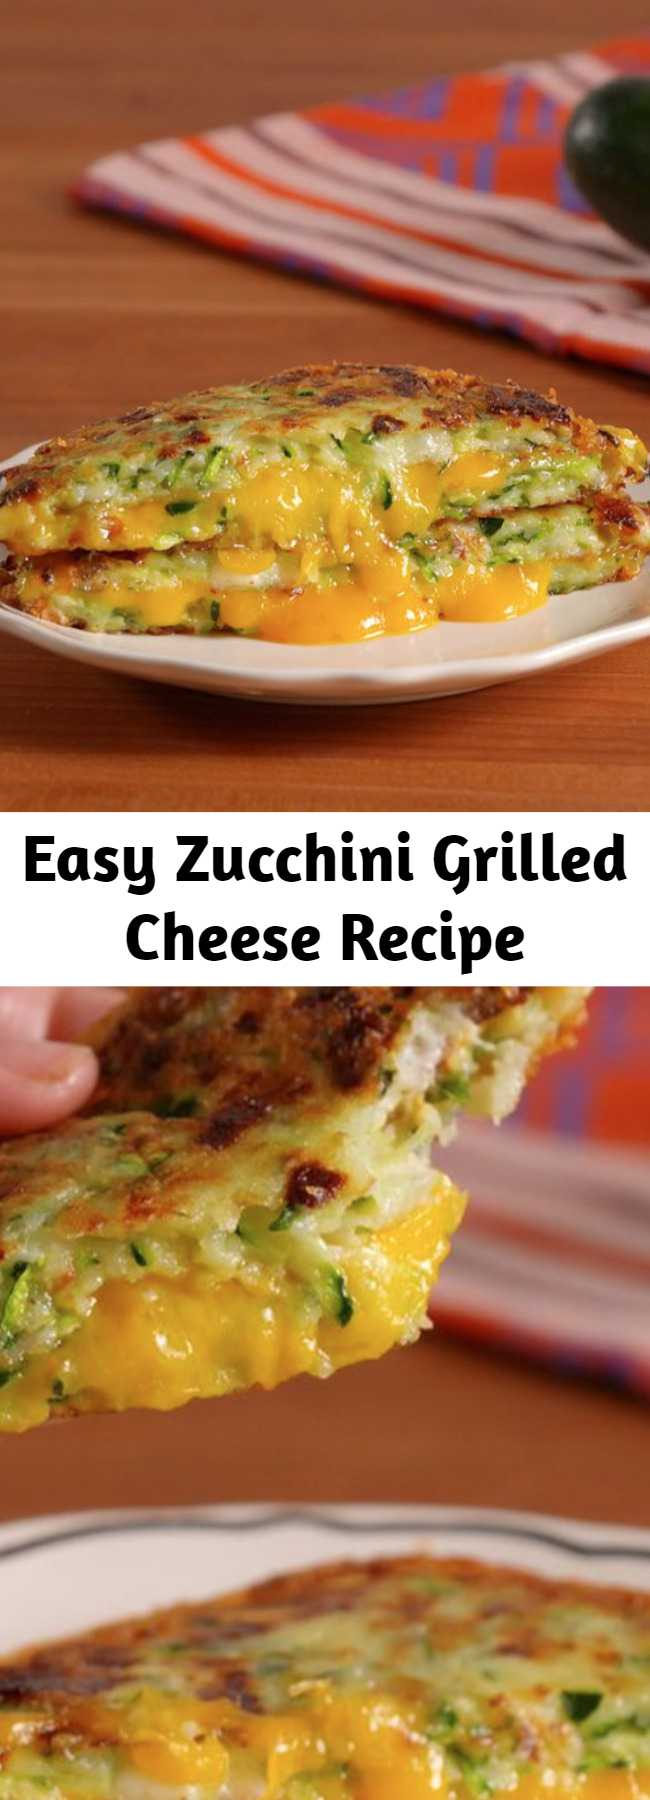 Easy Zucchini Grilled Cheese Recipe - Zucchini is so the new cauliflower. Zucchini Grilled Cheese Is A Low-Carb Dream Come True.